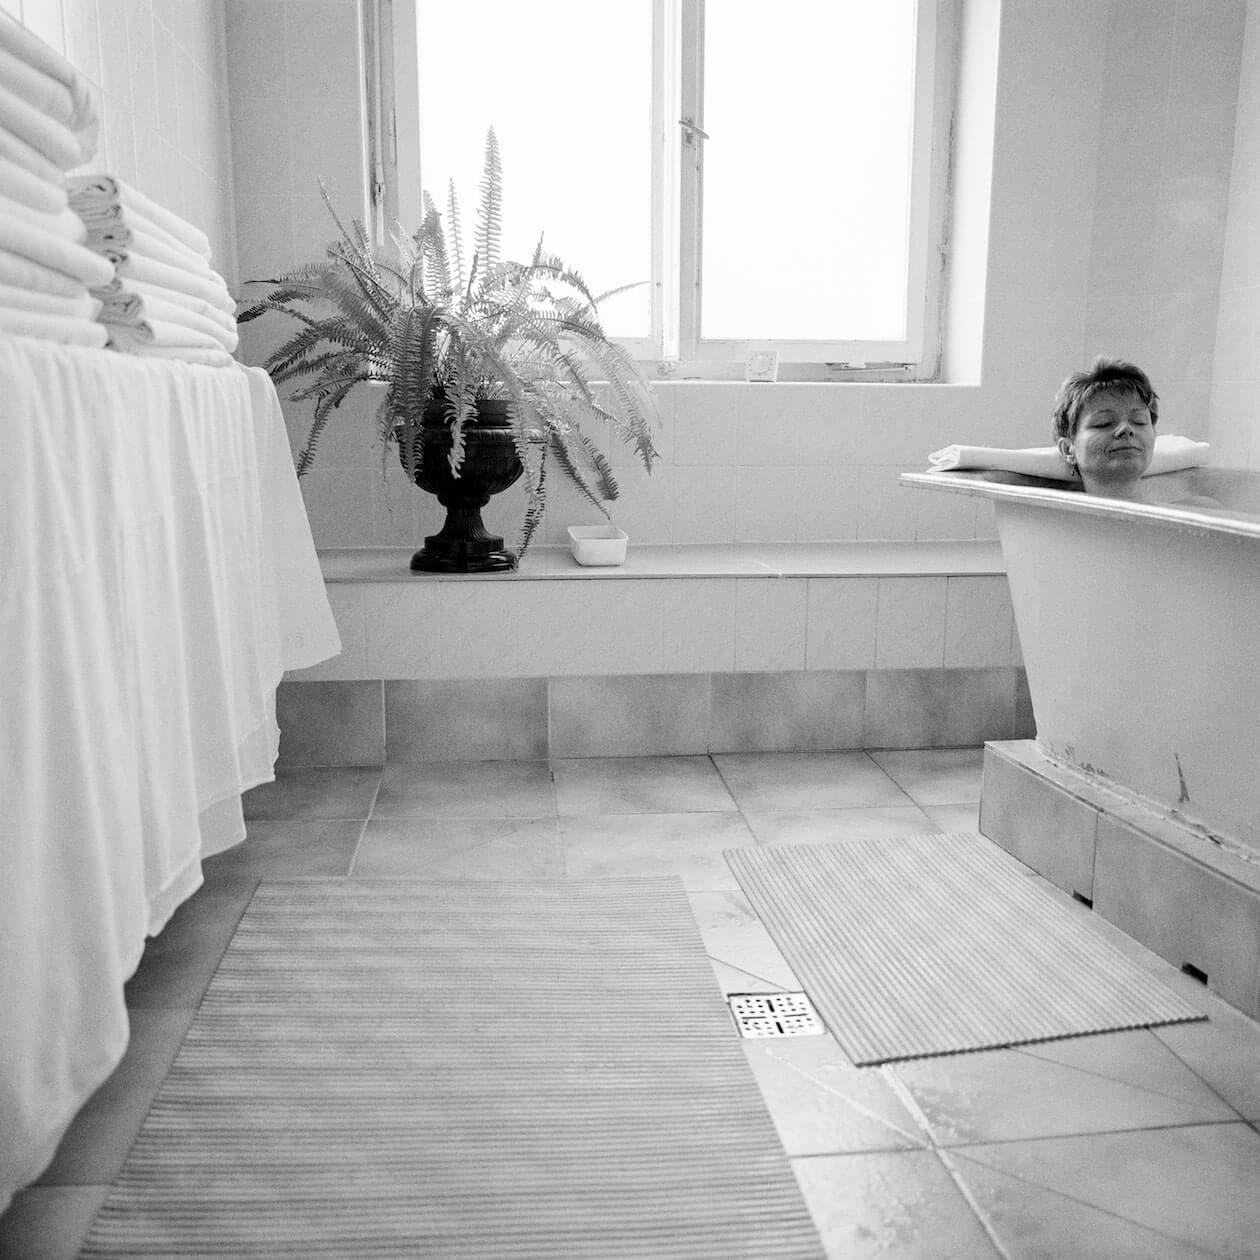 Woman in mineral bath